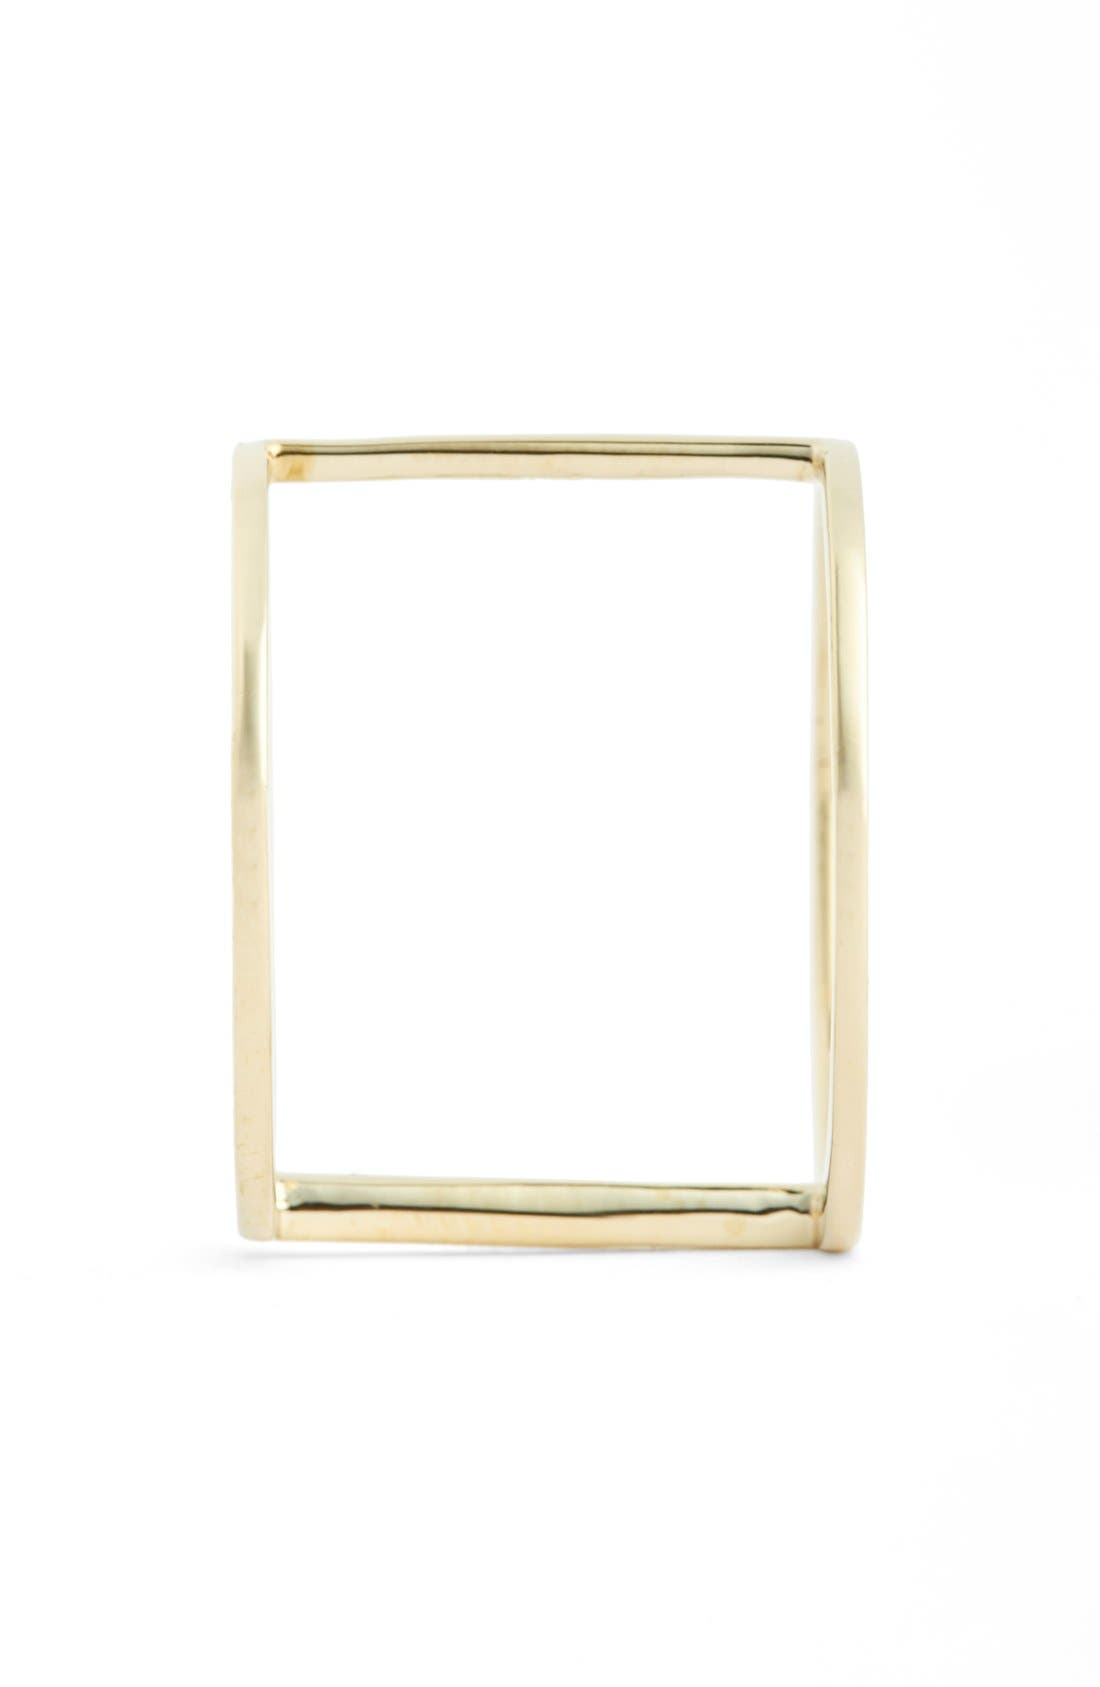 14k GoldBar Ring,                             Alternate thumbnail 2, color,                             Yellow Gold